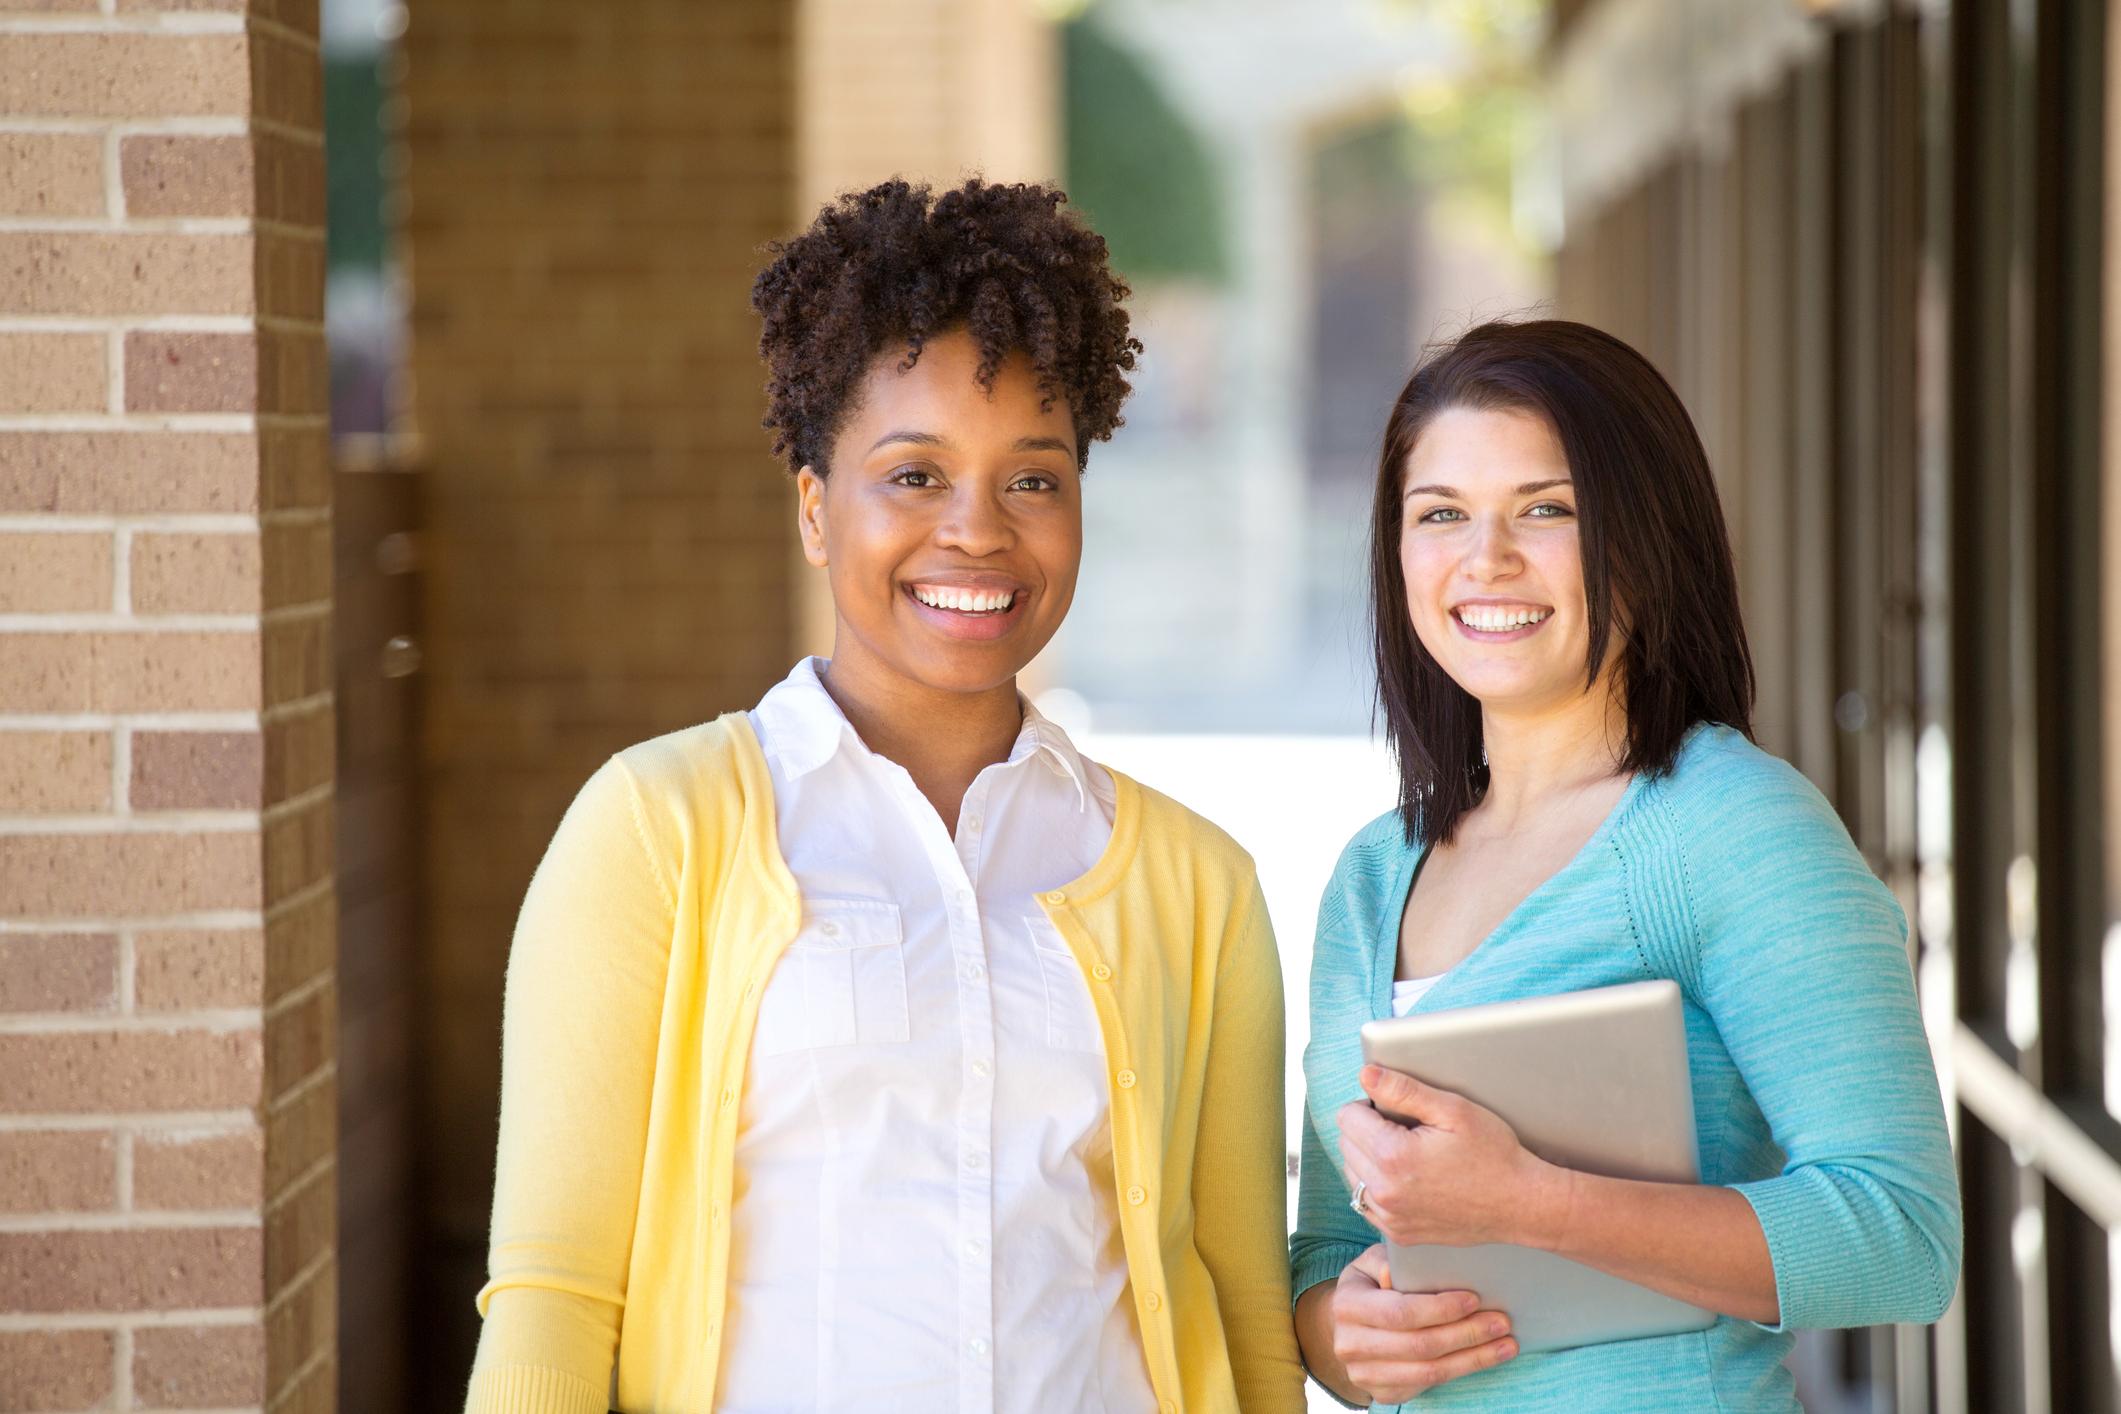 Business women standing outside an office building.